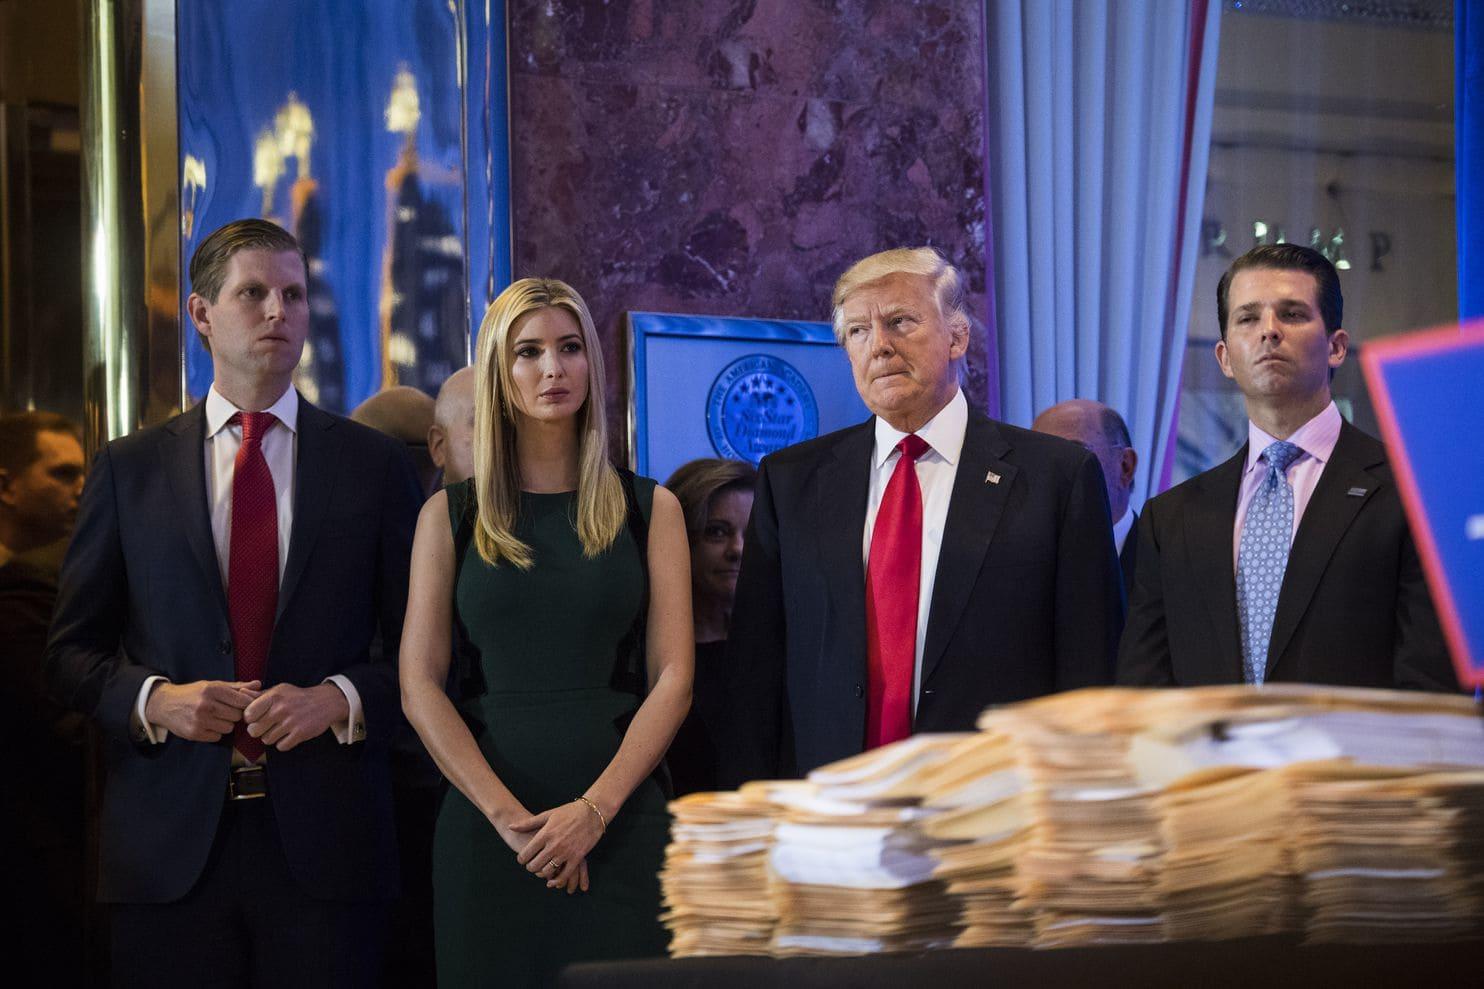 Eric, Ivanka, Donald y Donald Jr. Trump (Jabin Botsford/The Washington Post)